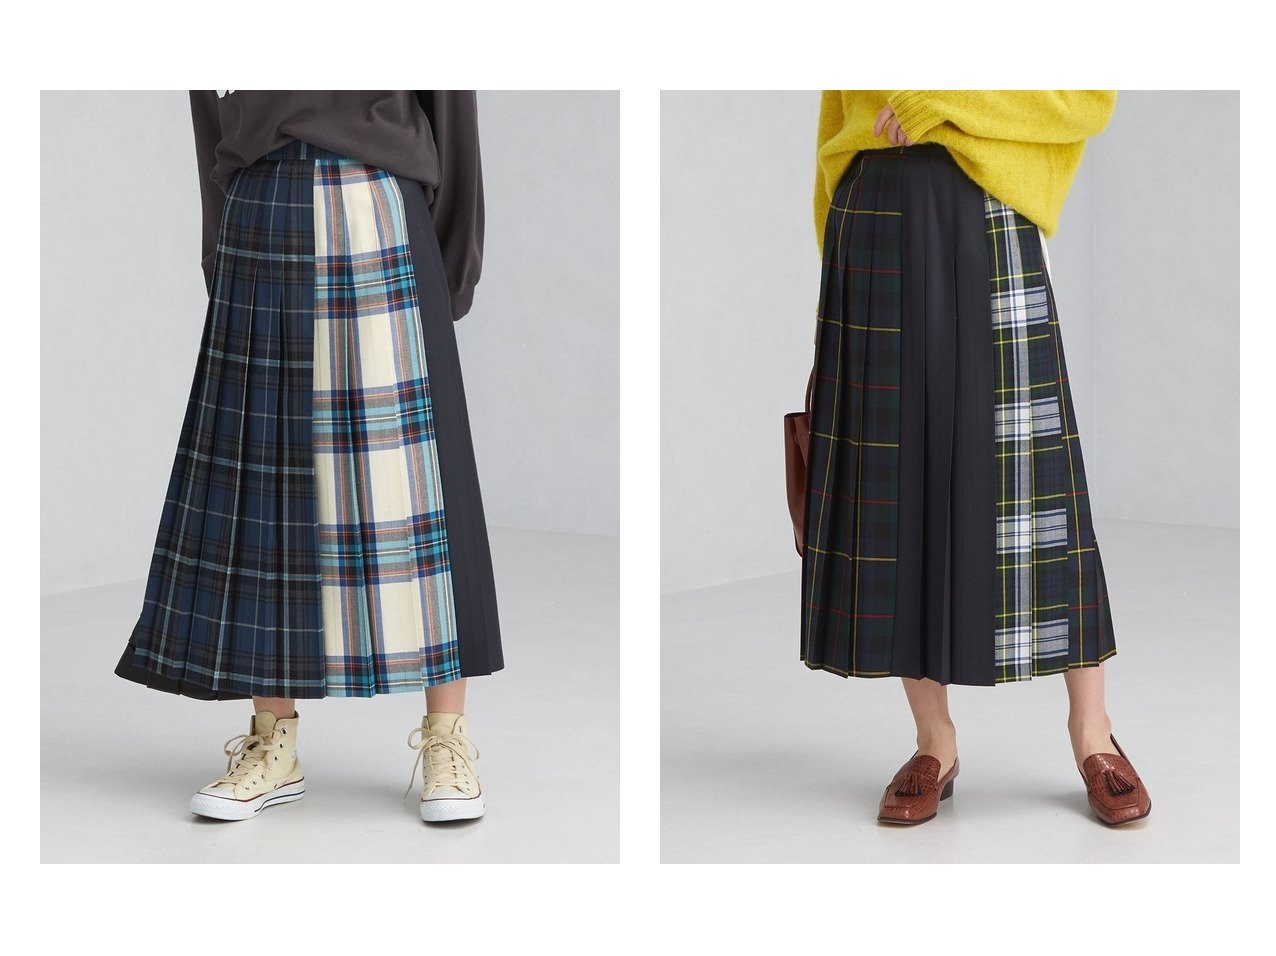 【green label relaxing / UNITED ARROWS/グリーンレーベル リラクシング / ユナイテッドアローズ】の【別注】 O NEIL OF DUBLIN(オニールオブダブリン) パッチ PL 83 スカート 別注・限定・コラボなど、おすすめ!人気、トレンド・レディースファッションの通販 おすすめで人気の流行・トレンド、ファッションの通販商品 インテリア・家具・メンズファッション・キッズファッション・レディースファッション・服の通販 founy(ファニー) https://founy.com/ ファッション Fashion レディースファッション WOMEN スカート Skirt ロングスカート Long Skirt キルト クラシカル ショート スニーカー スペシャル バランス パッチ 別注 ロング NEW・新作・新着・新入荷 New Arrivals おすすめ Recommend  ID:crp329100000066894